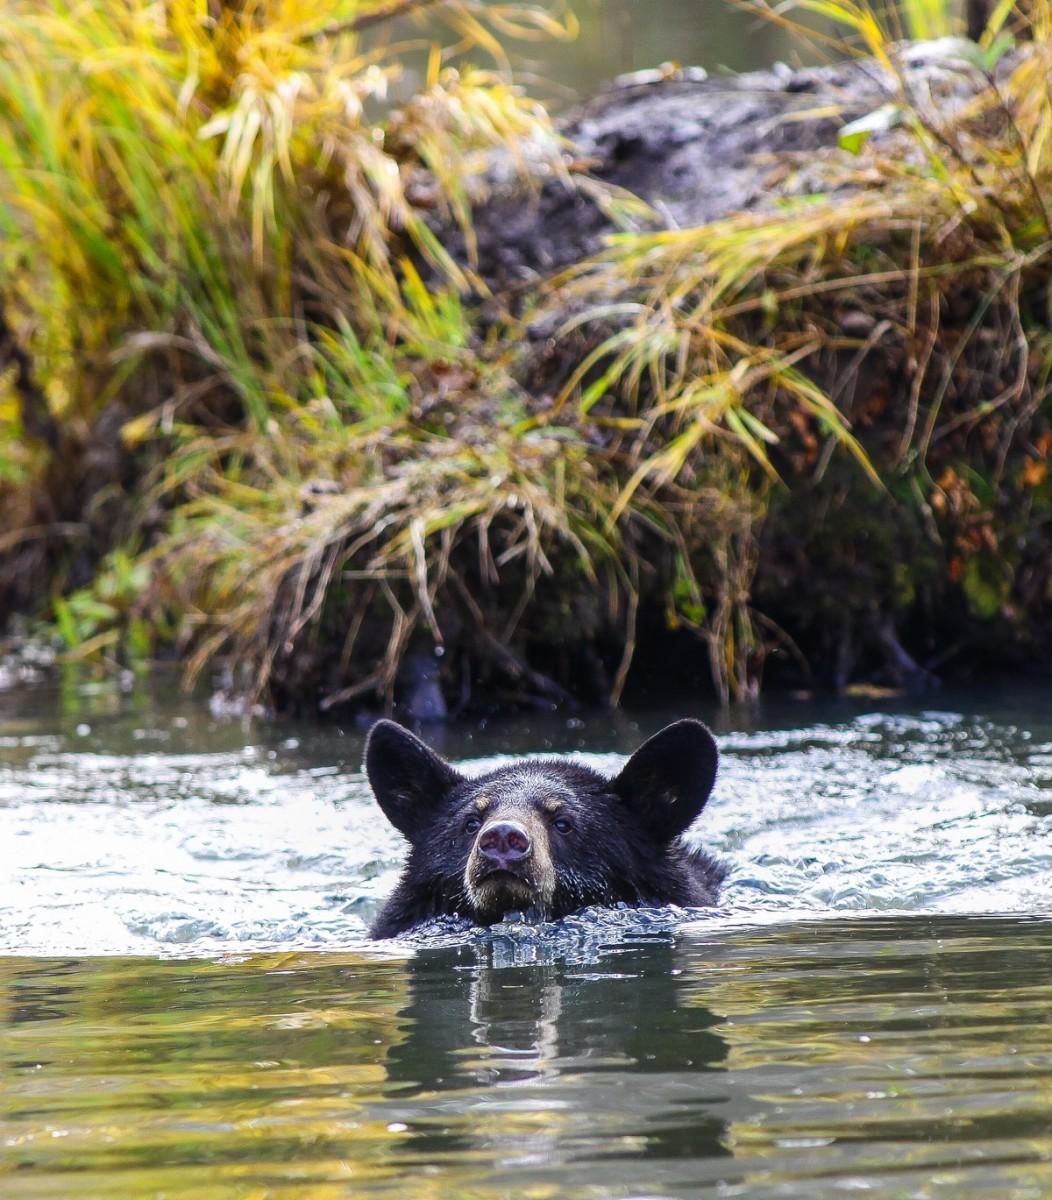 Black bear conservation